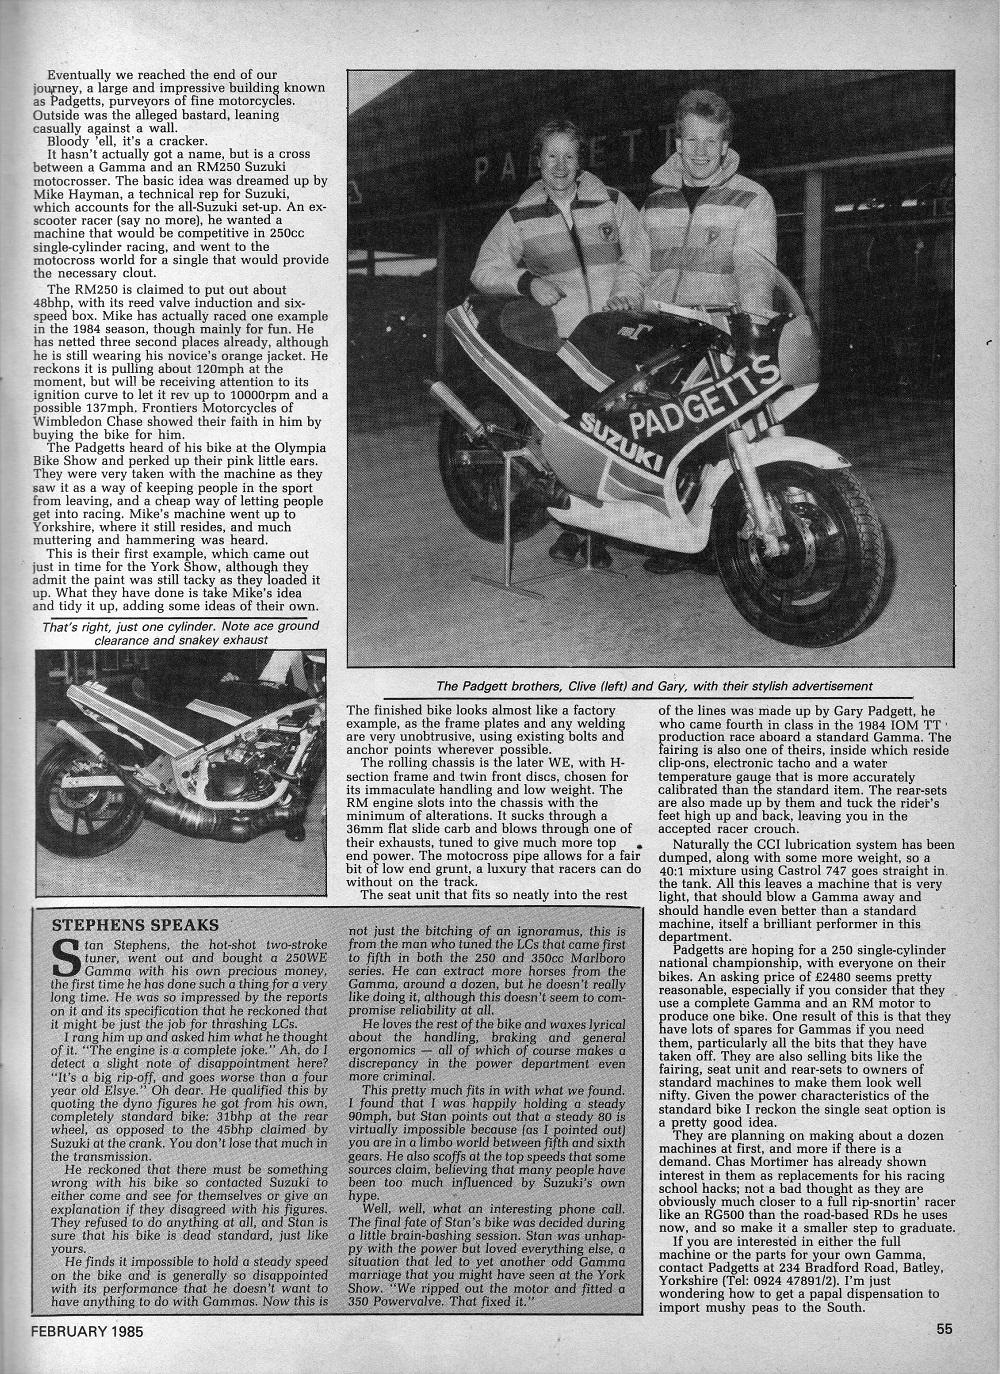 1985 Suzuki RG250 Gamma road test.5.jpg